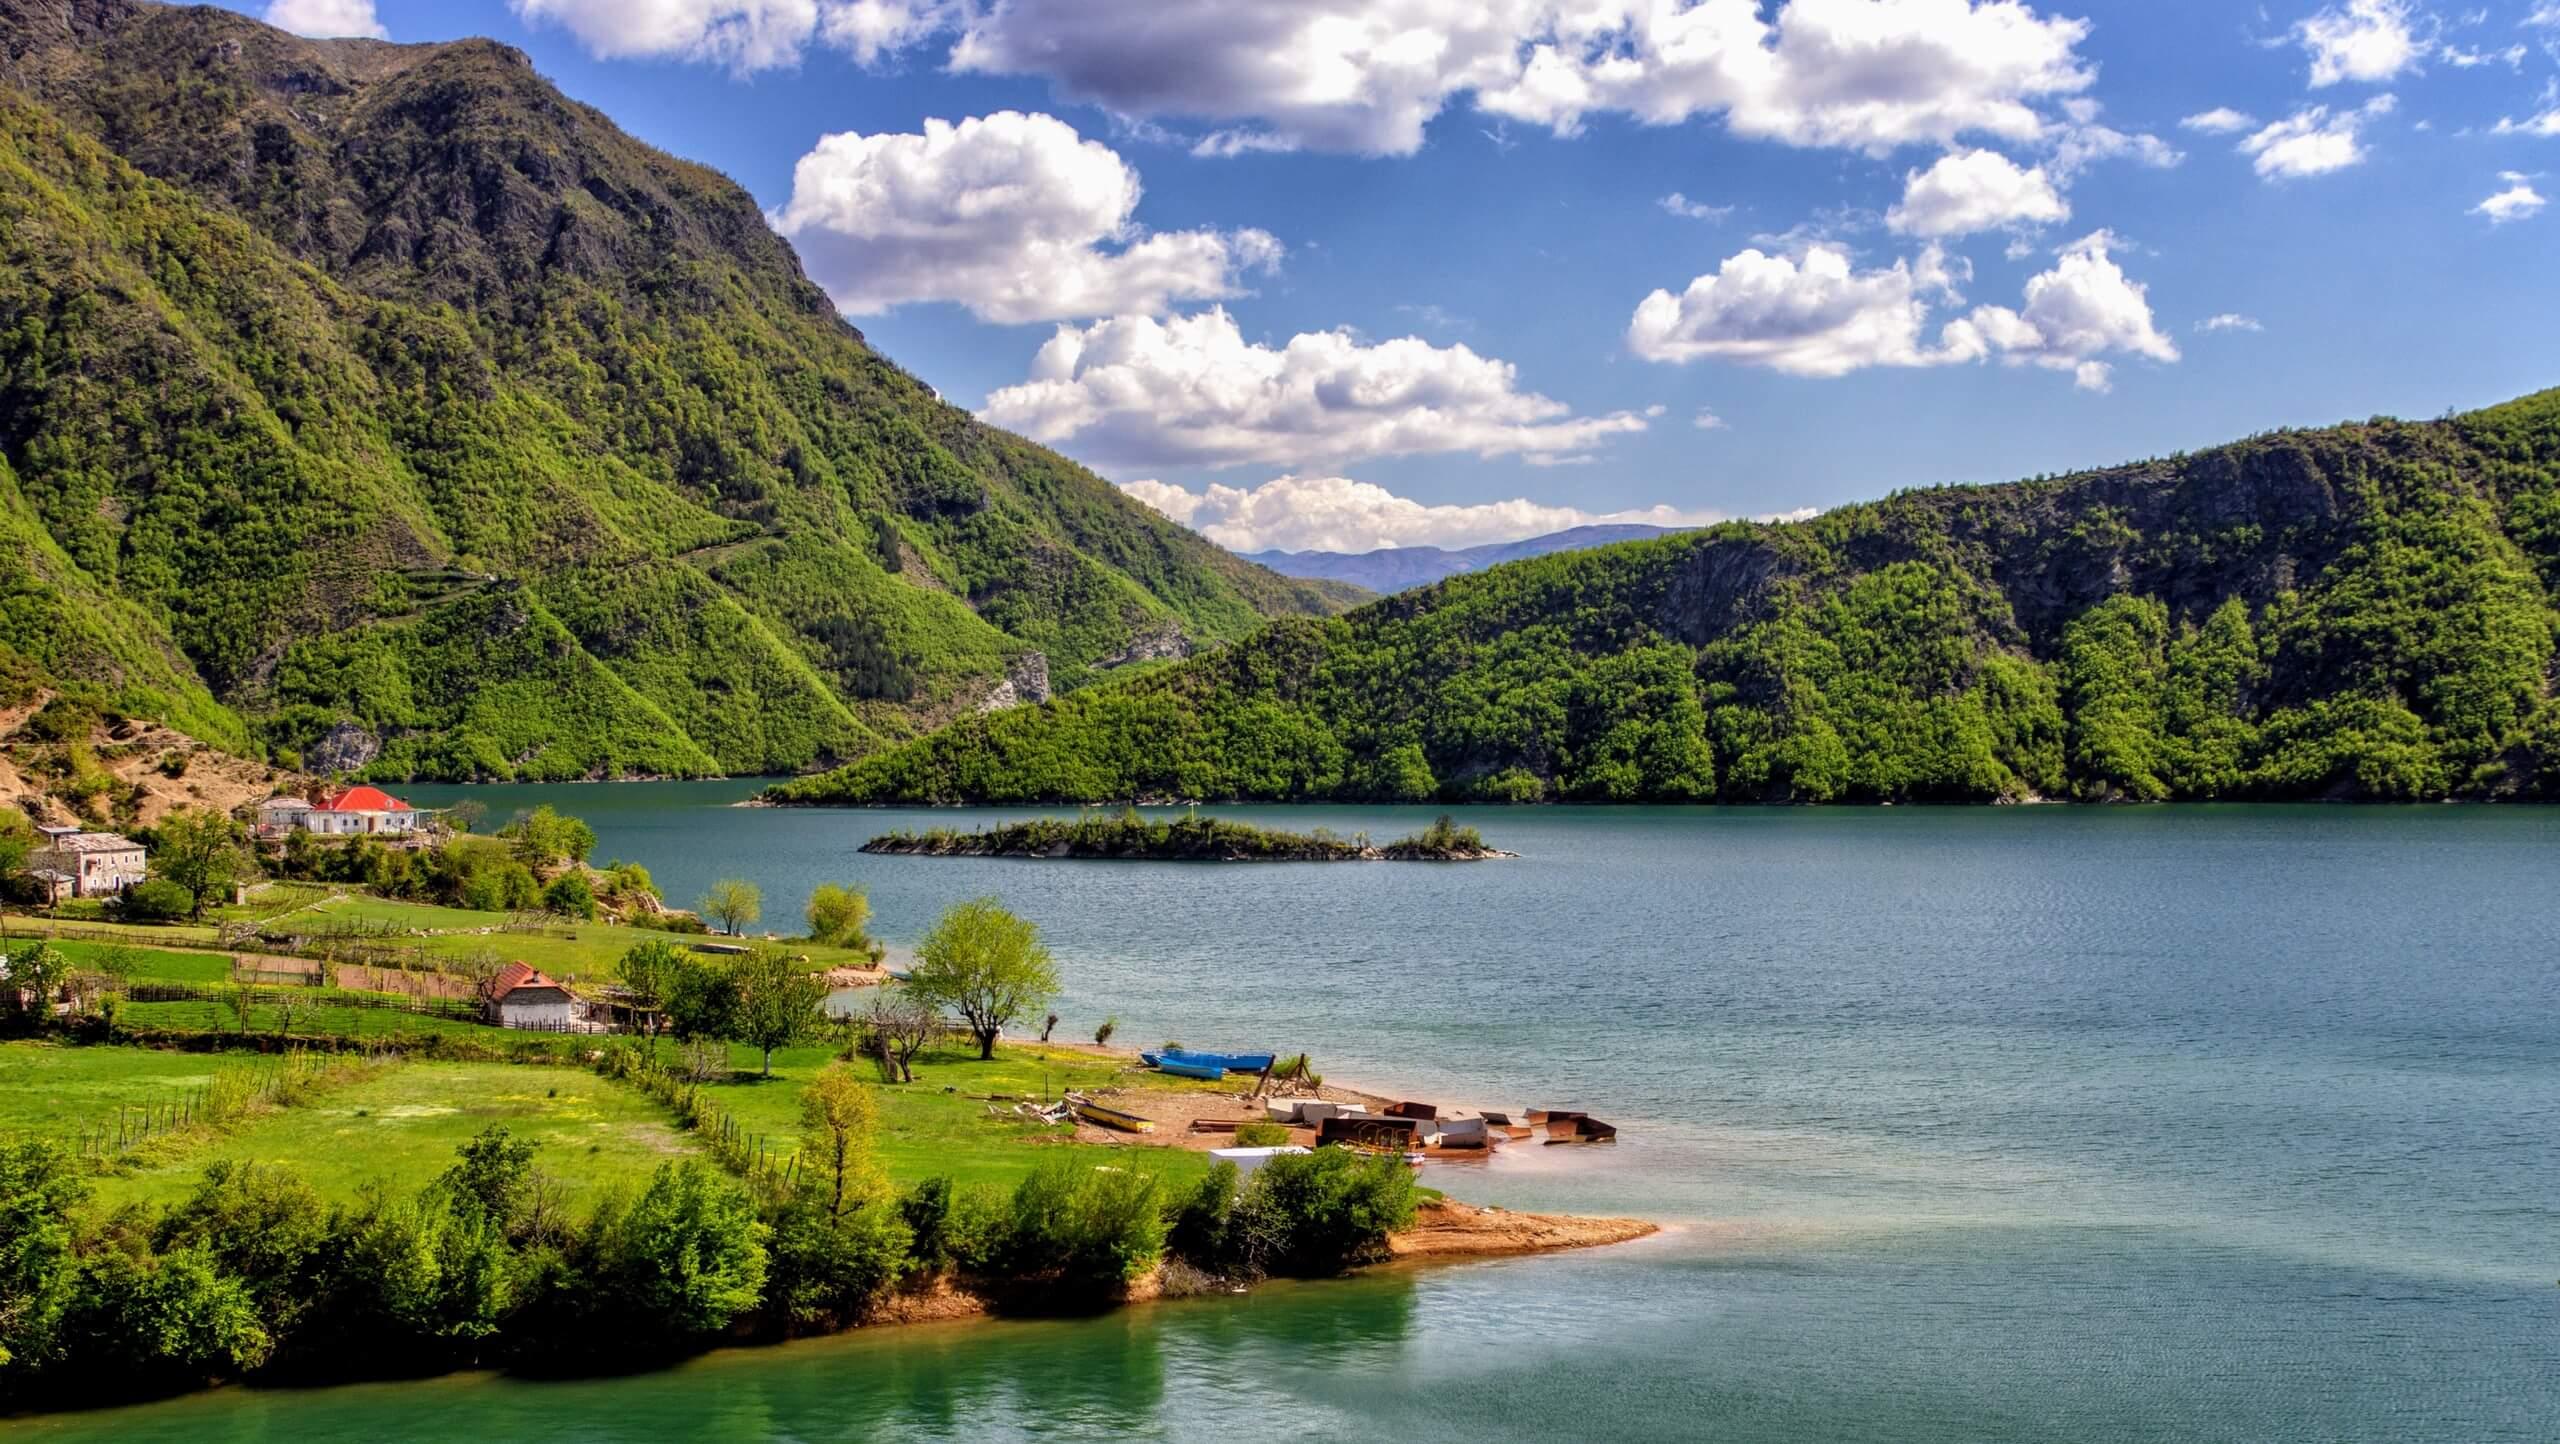 Albania, Kosovo and North Macedonia Hiking Tour